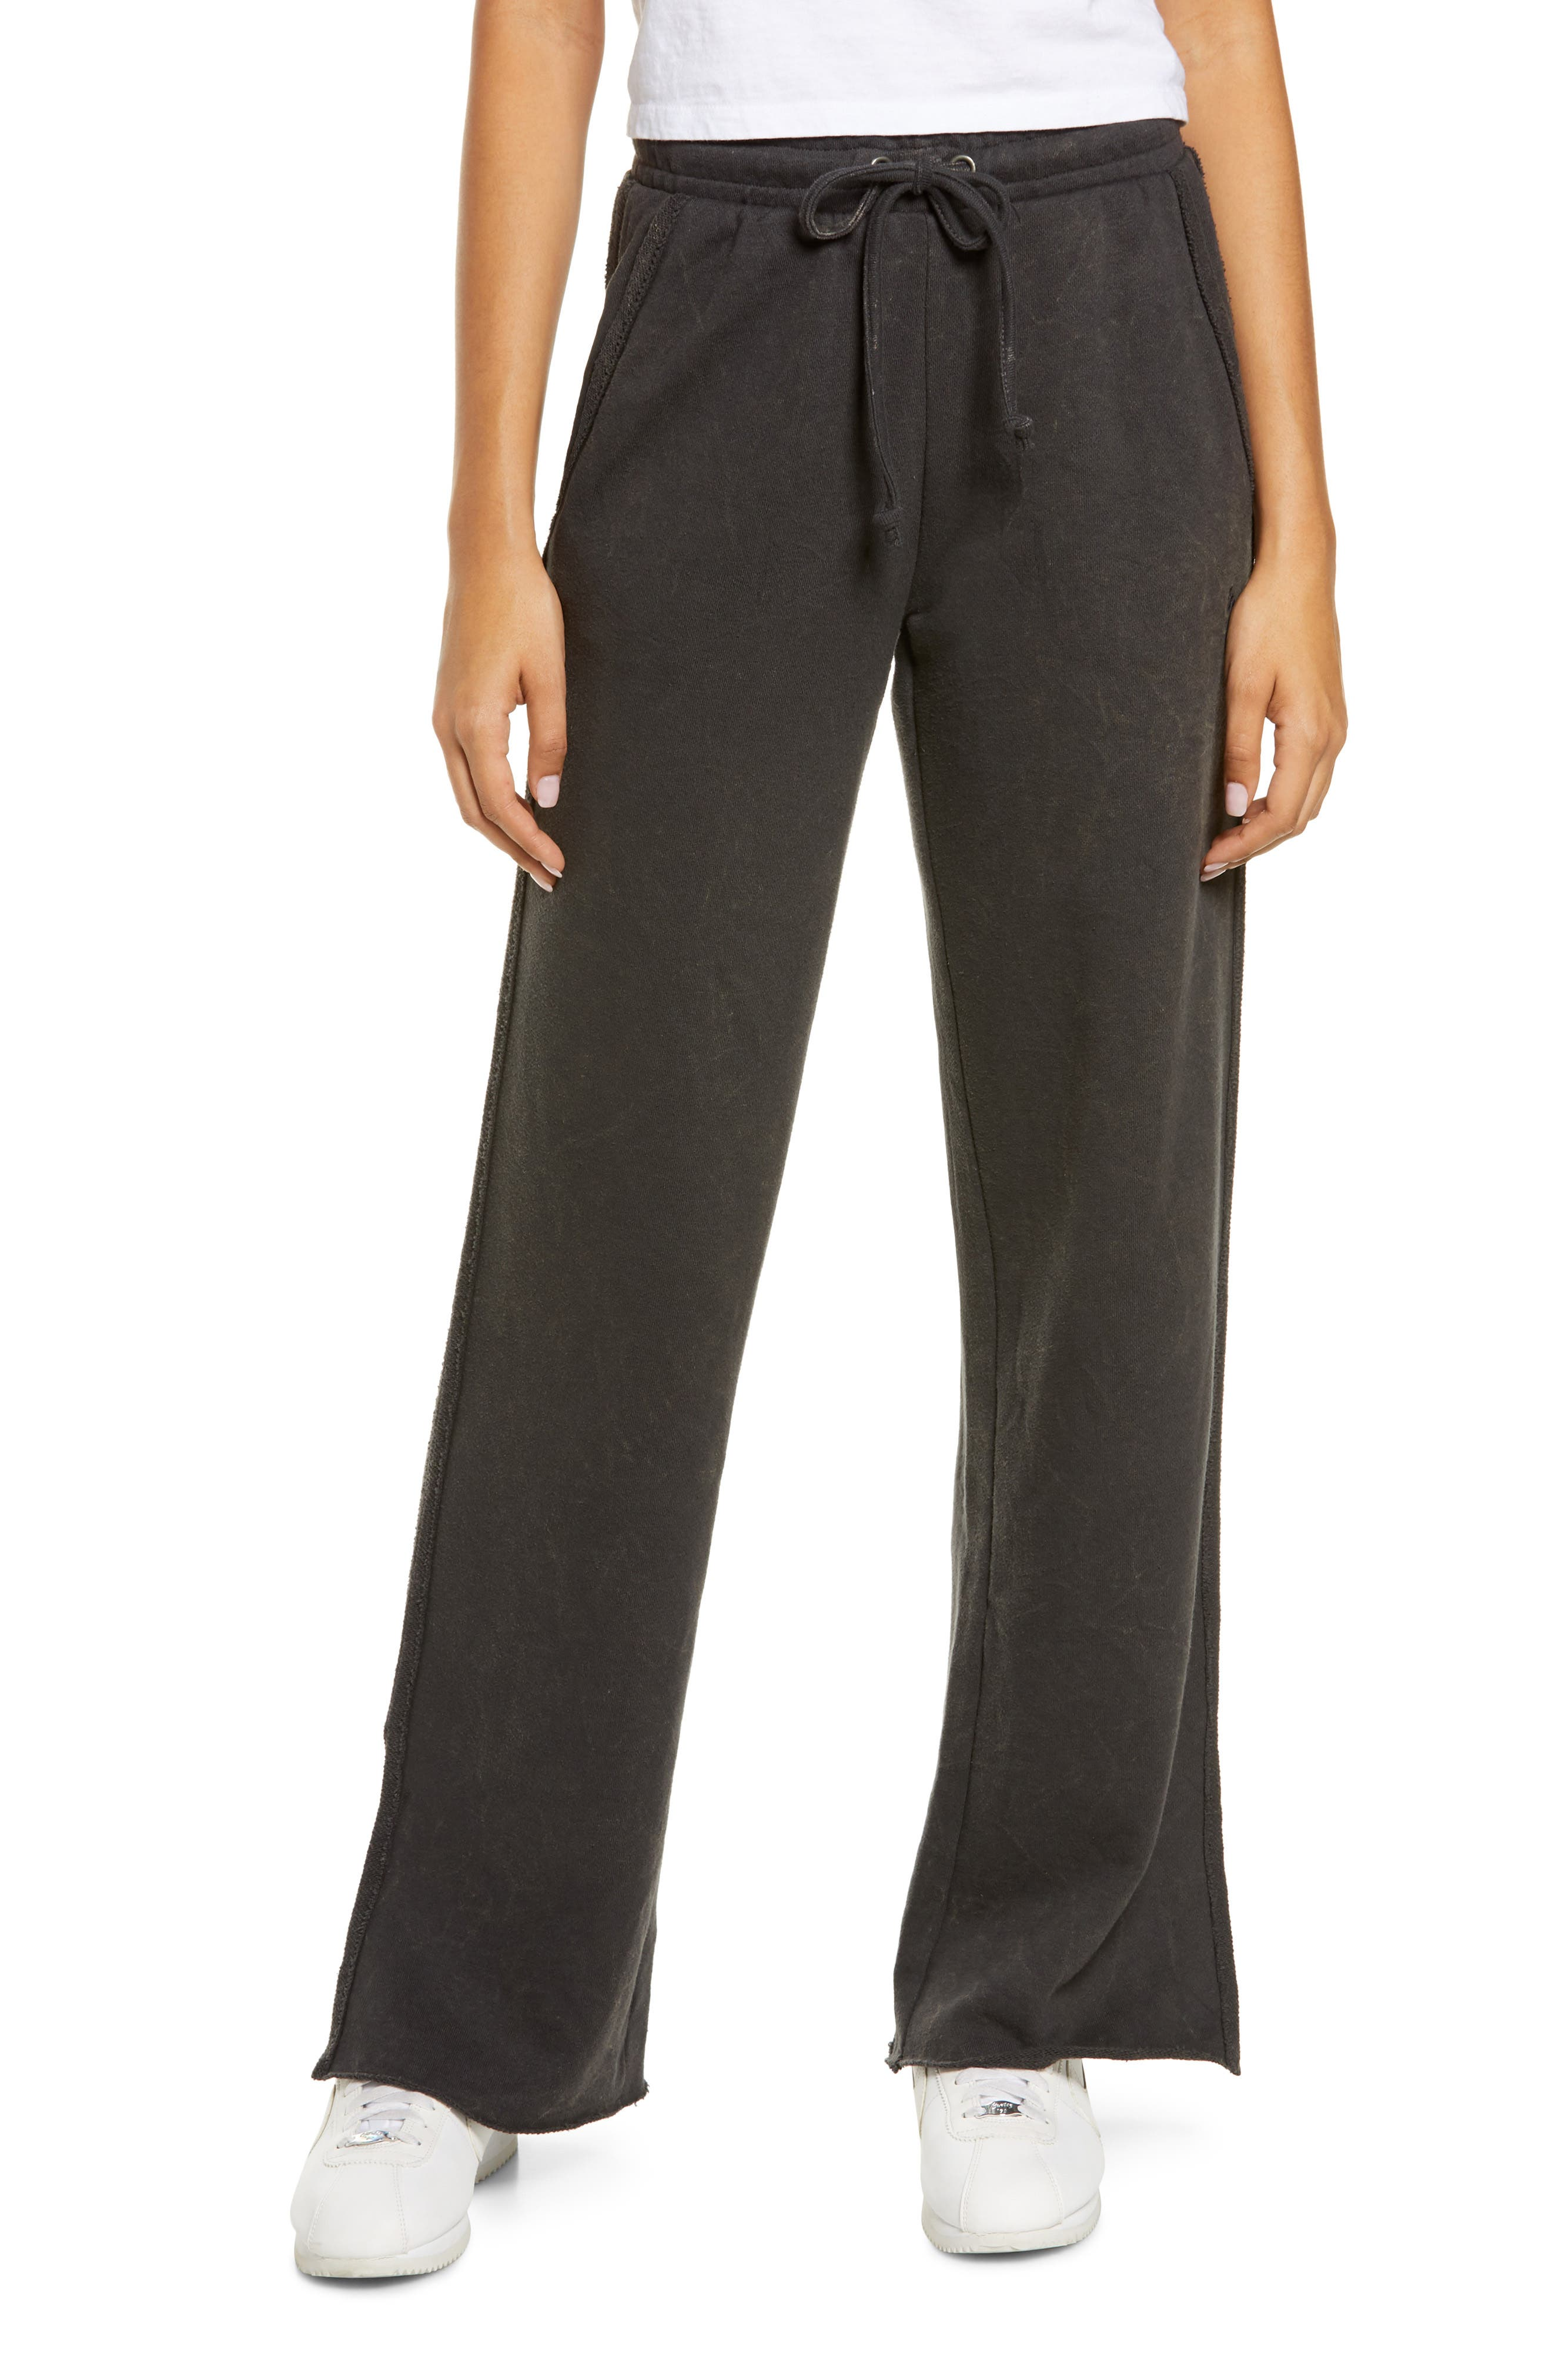 Women's Loopside Slit Hem French Terry Lounge Pants